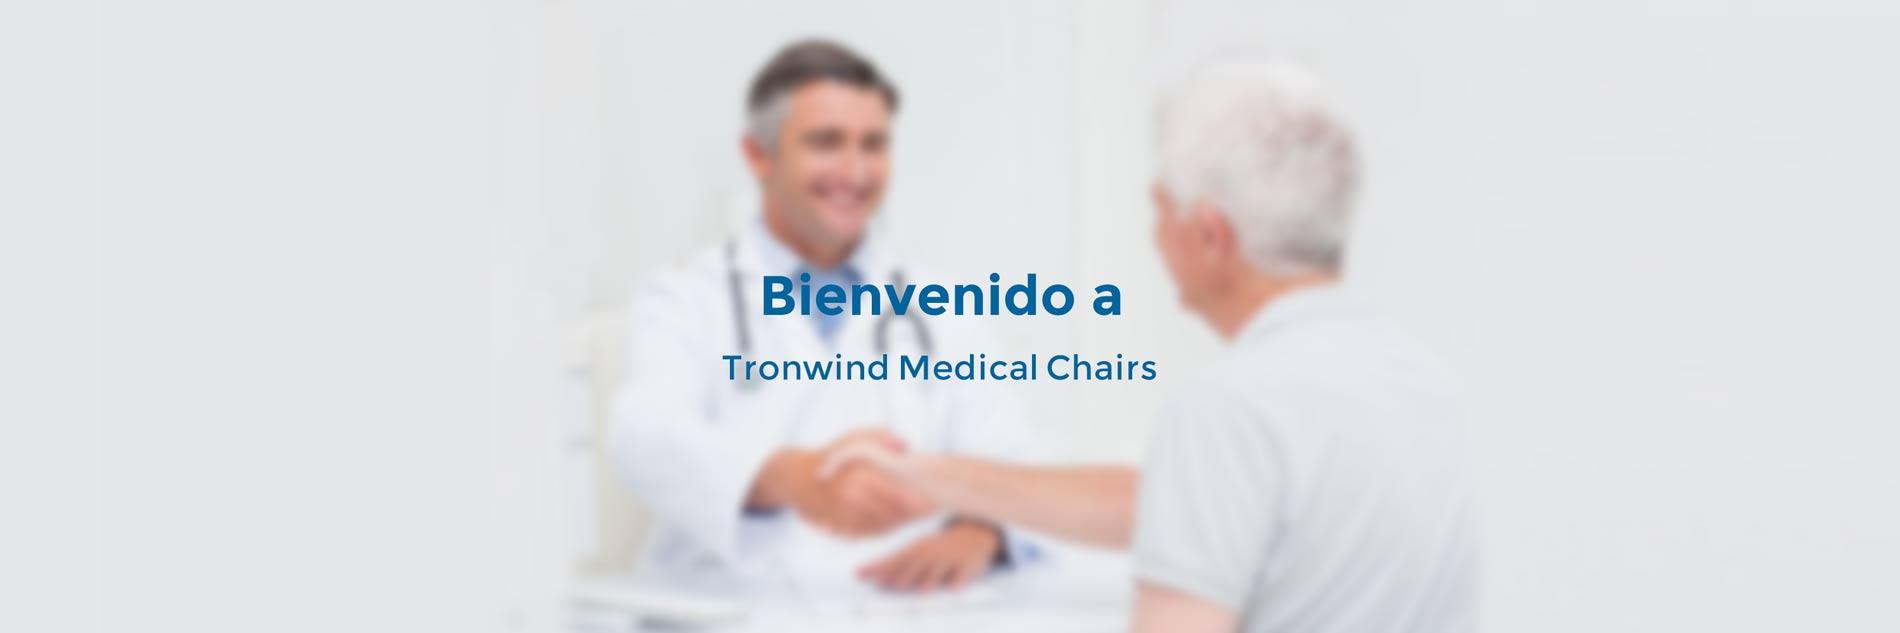 Bienvenido-a-Trowind Medical Chairs